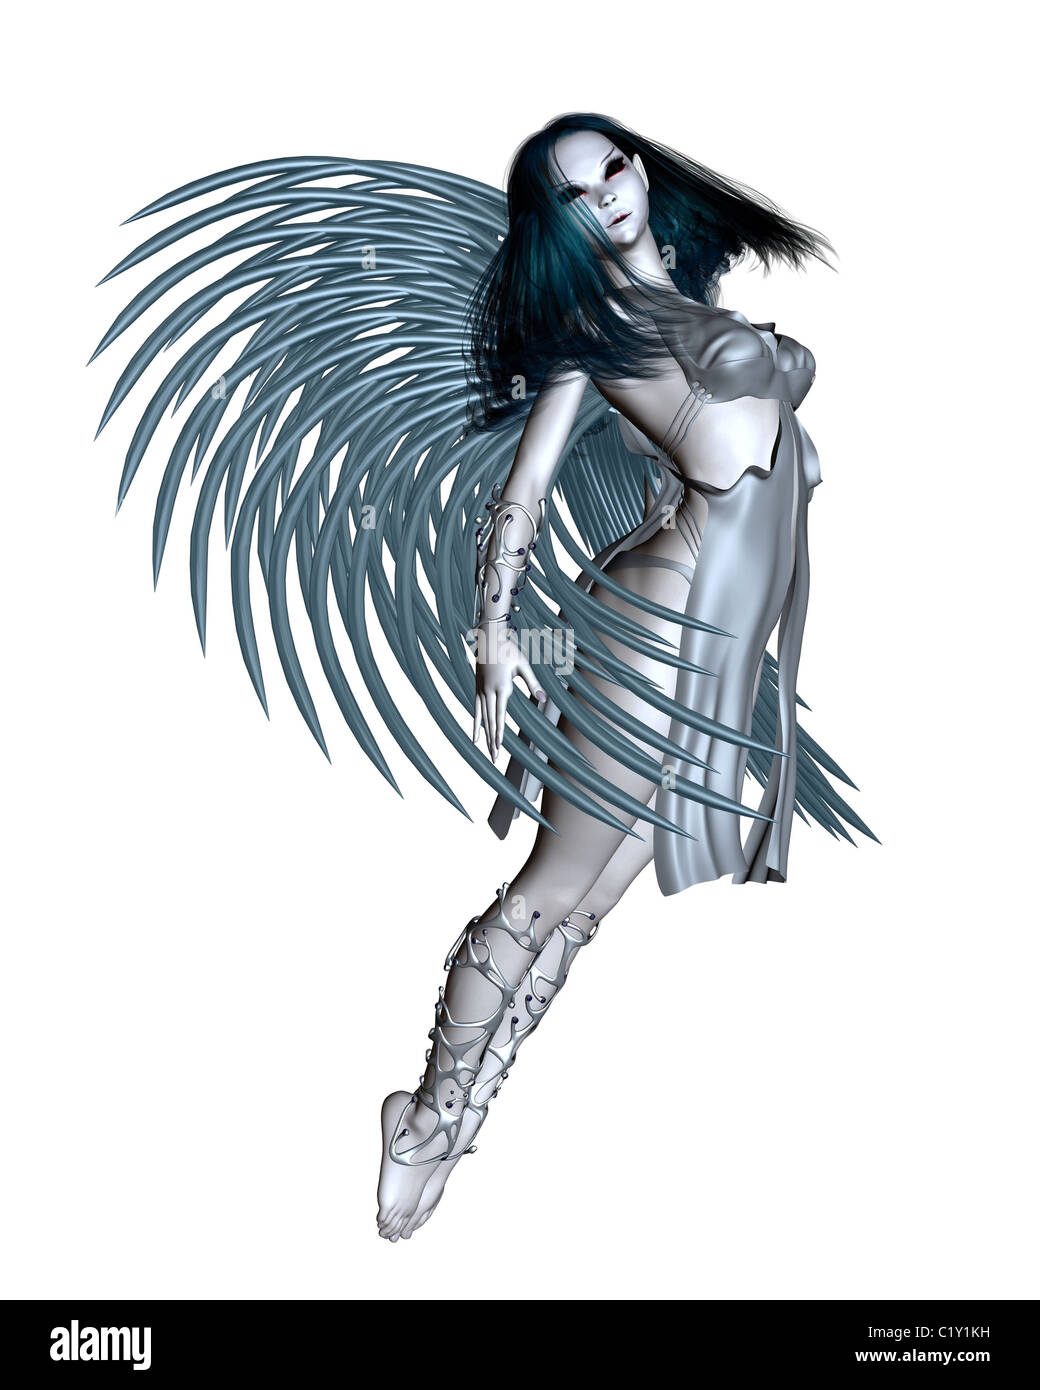 Alien Angel - 1 - Stock Image